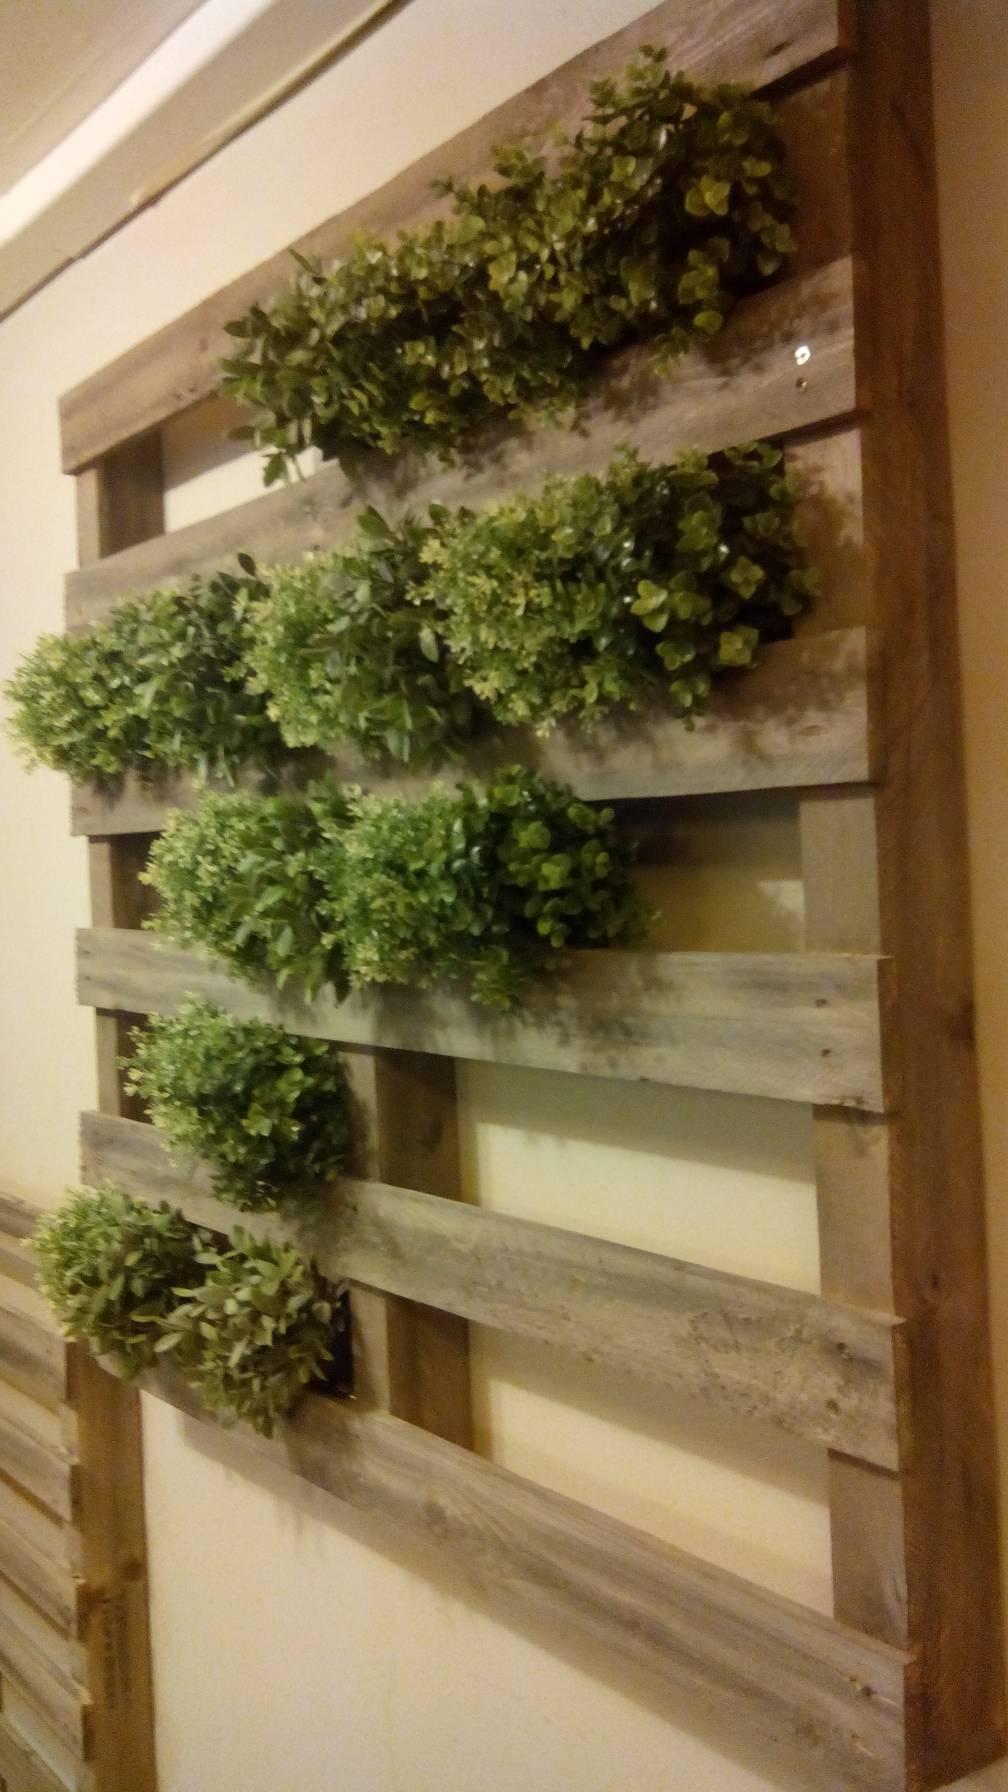 Innovative DIY Pallet Vertical Garden Ideas | EASY DIY and CRAFTS